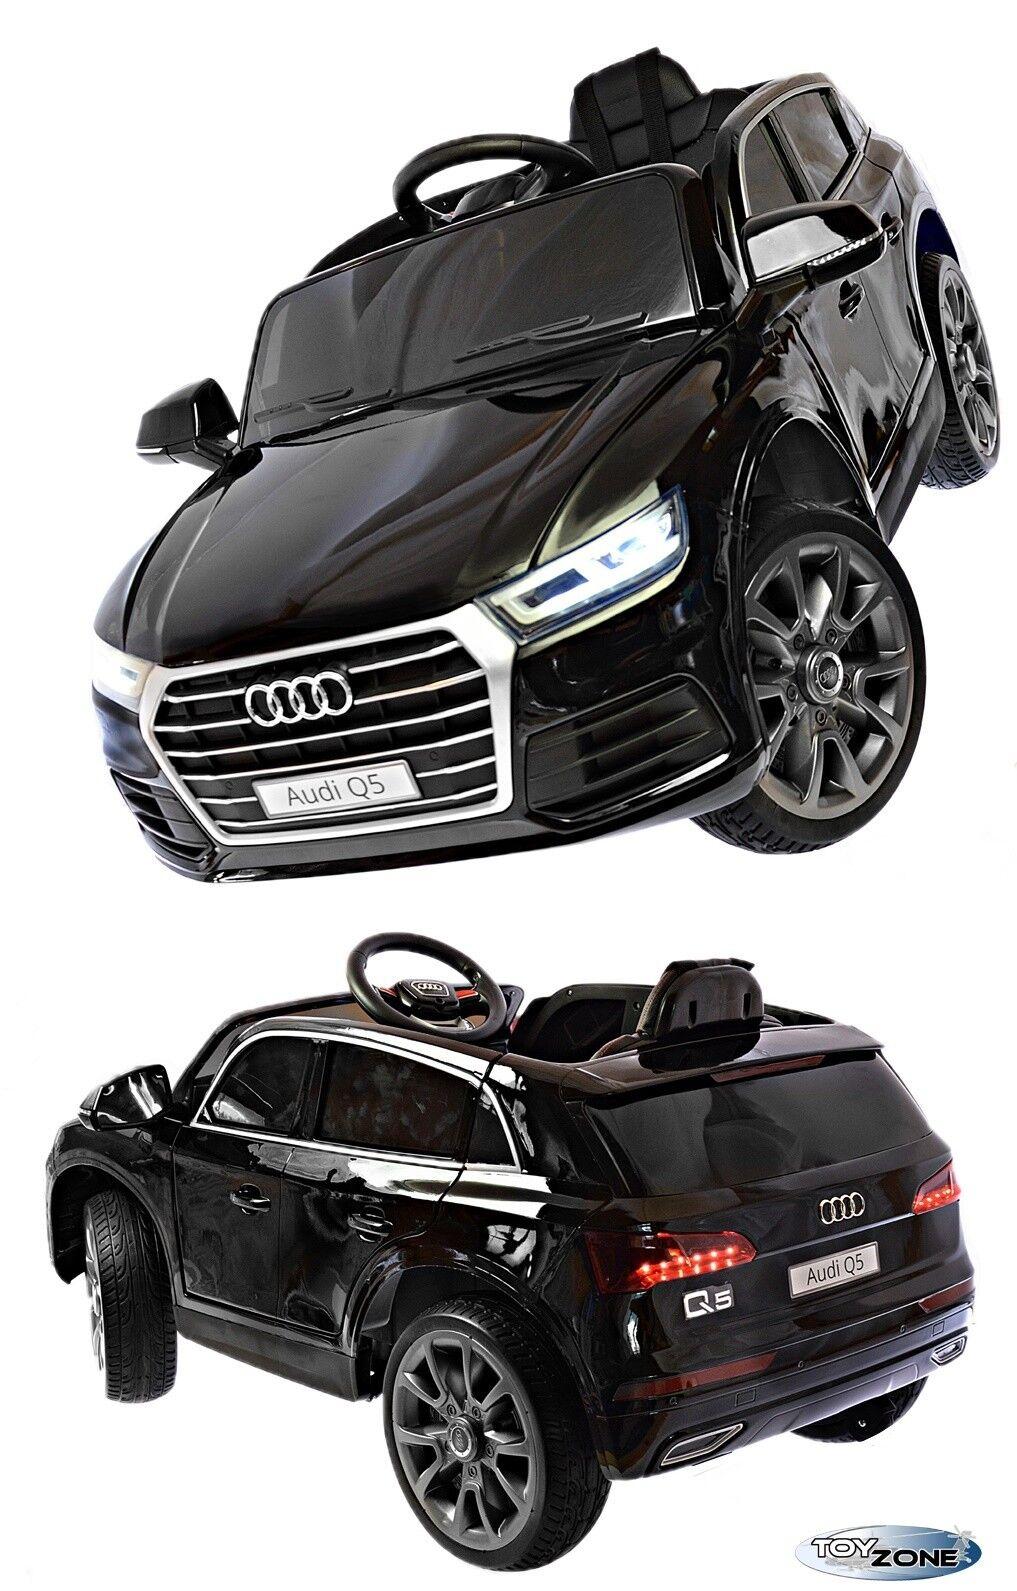 Kinderfahrzeug 12V Kinder Elektro Auto Audi Q5 Kinderauto Kinderauto Kinderauto MP3 Ledersitz EVA f0219f